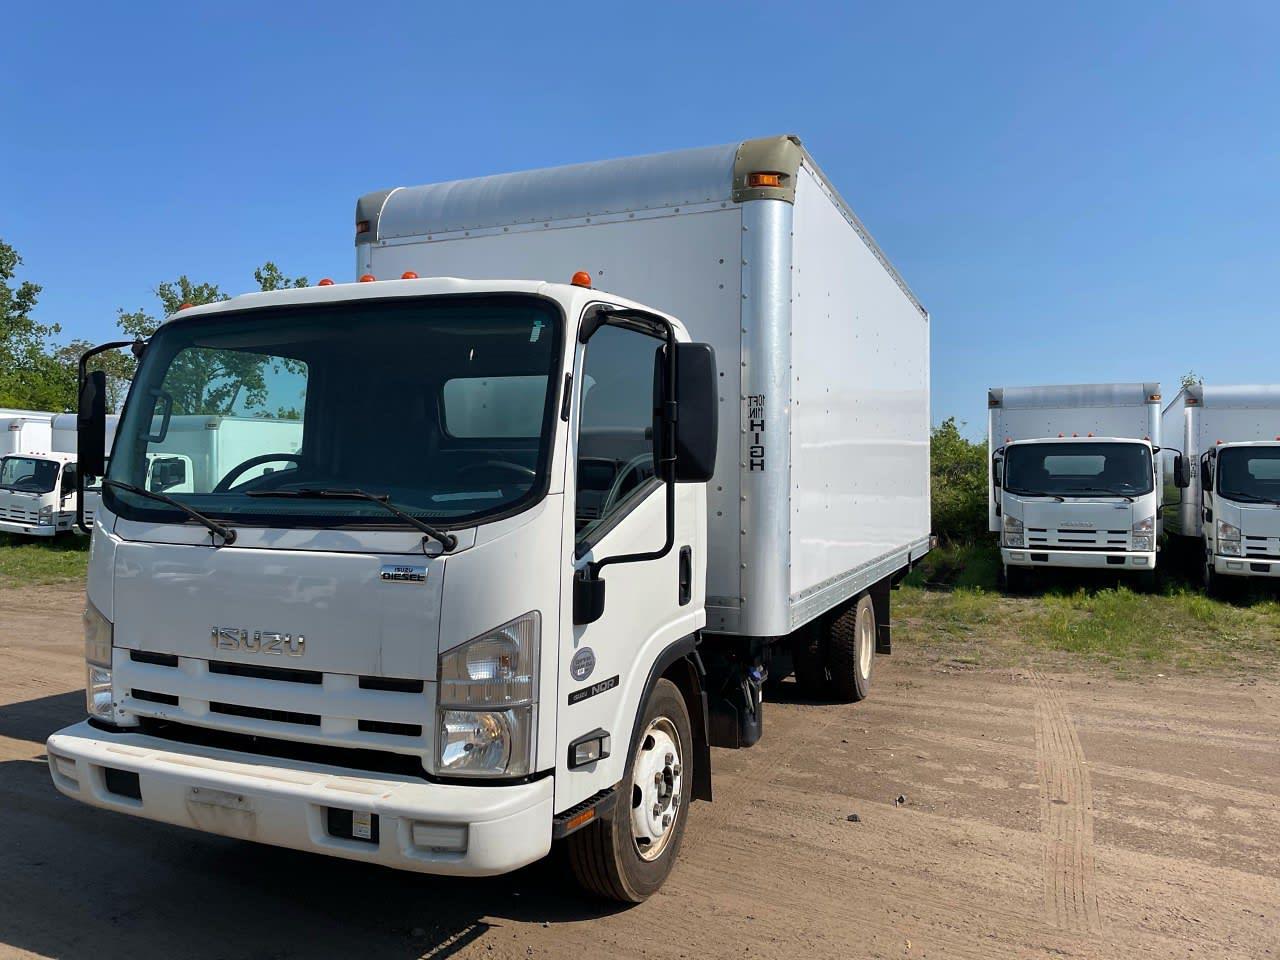 2015 Isuzu NQR Regular Cab 4x2, Dry Freight #650485 - photo 1